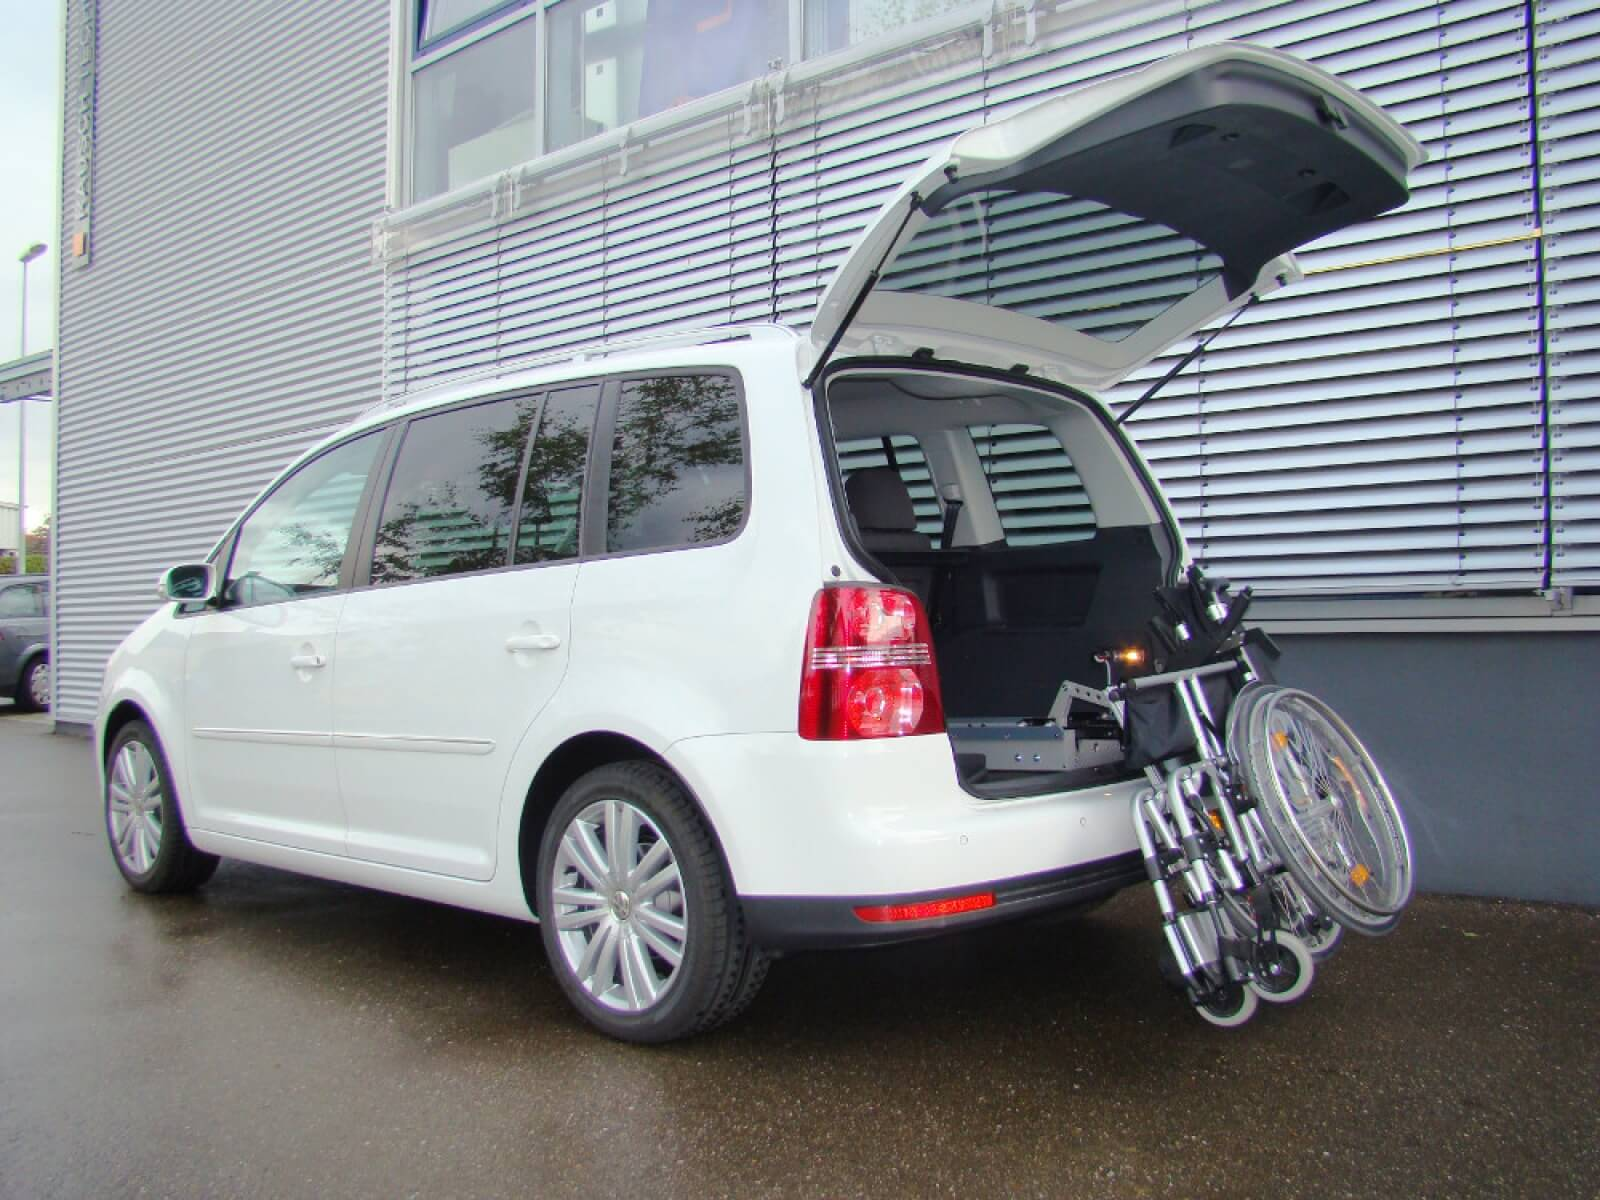 VW Touran Rollstuhl Verladehilfe